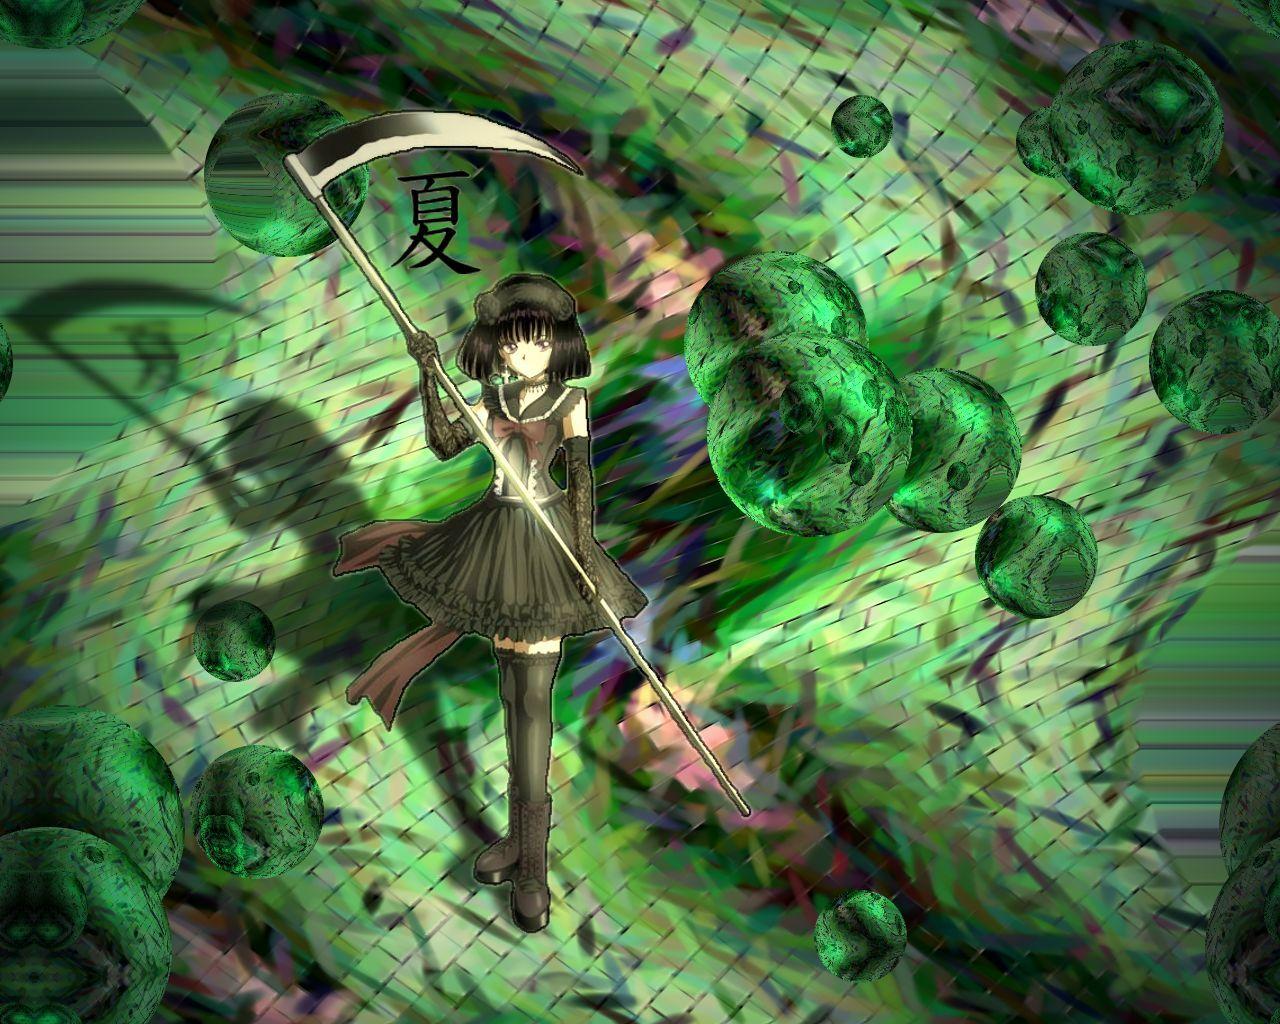 http://4.bp.blogspot.com/_sMdCwT2_YEE/TMkwxJSBW4I/AAAAAAAAADc/AiMaCf_NKLI/s1600/Fighting_Anime_Girl_Wallpaper.jpg